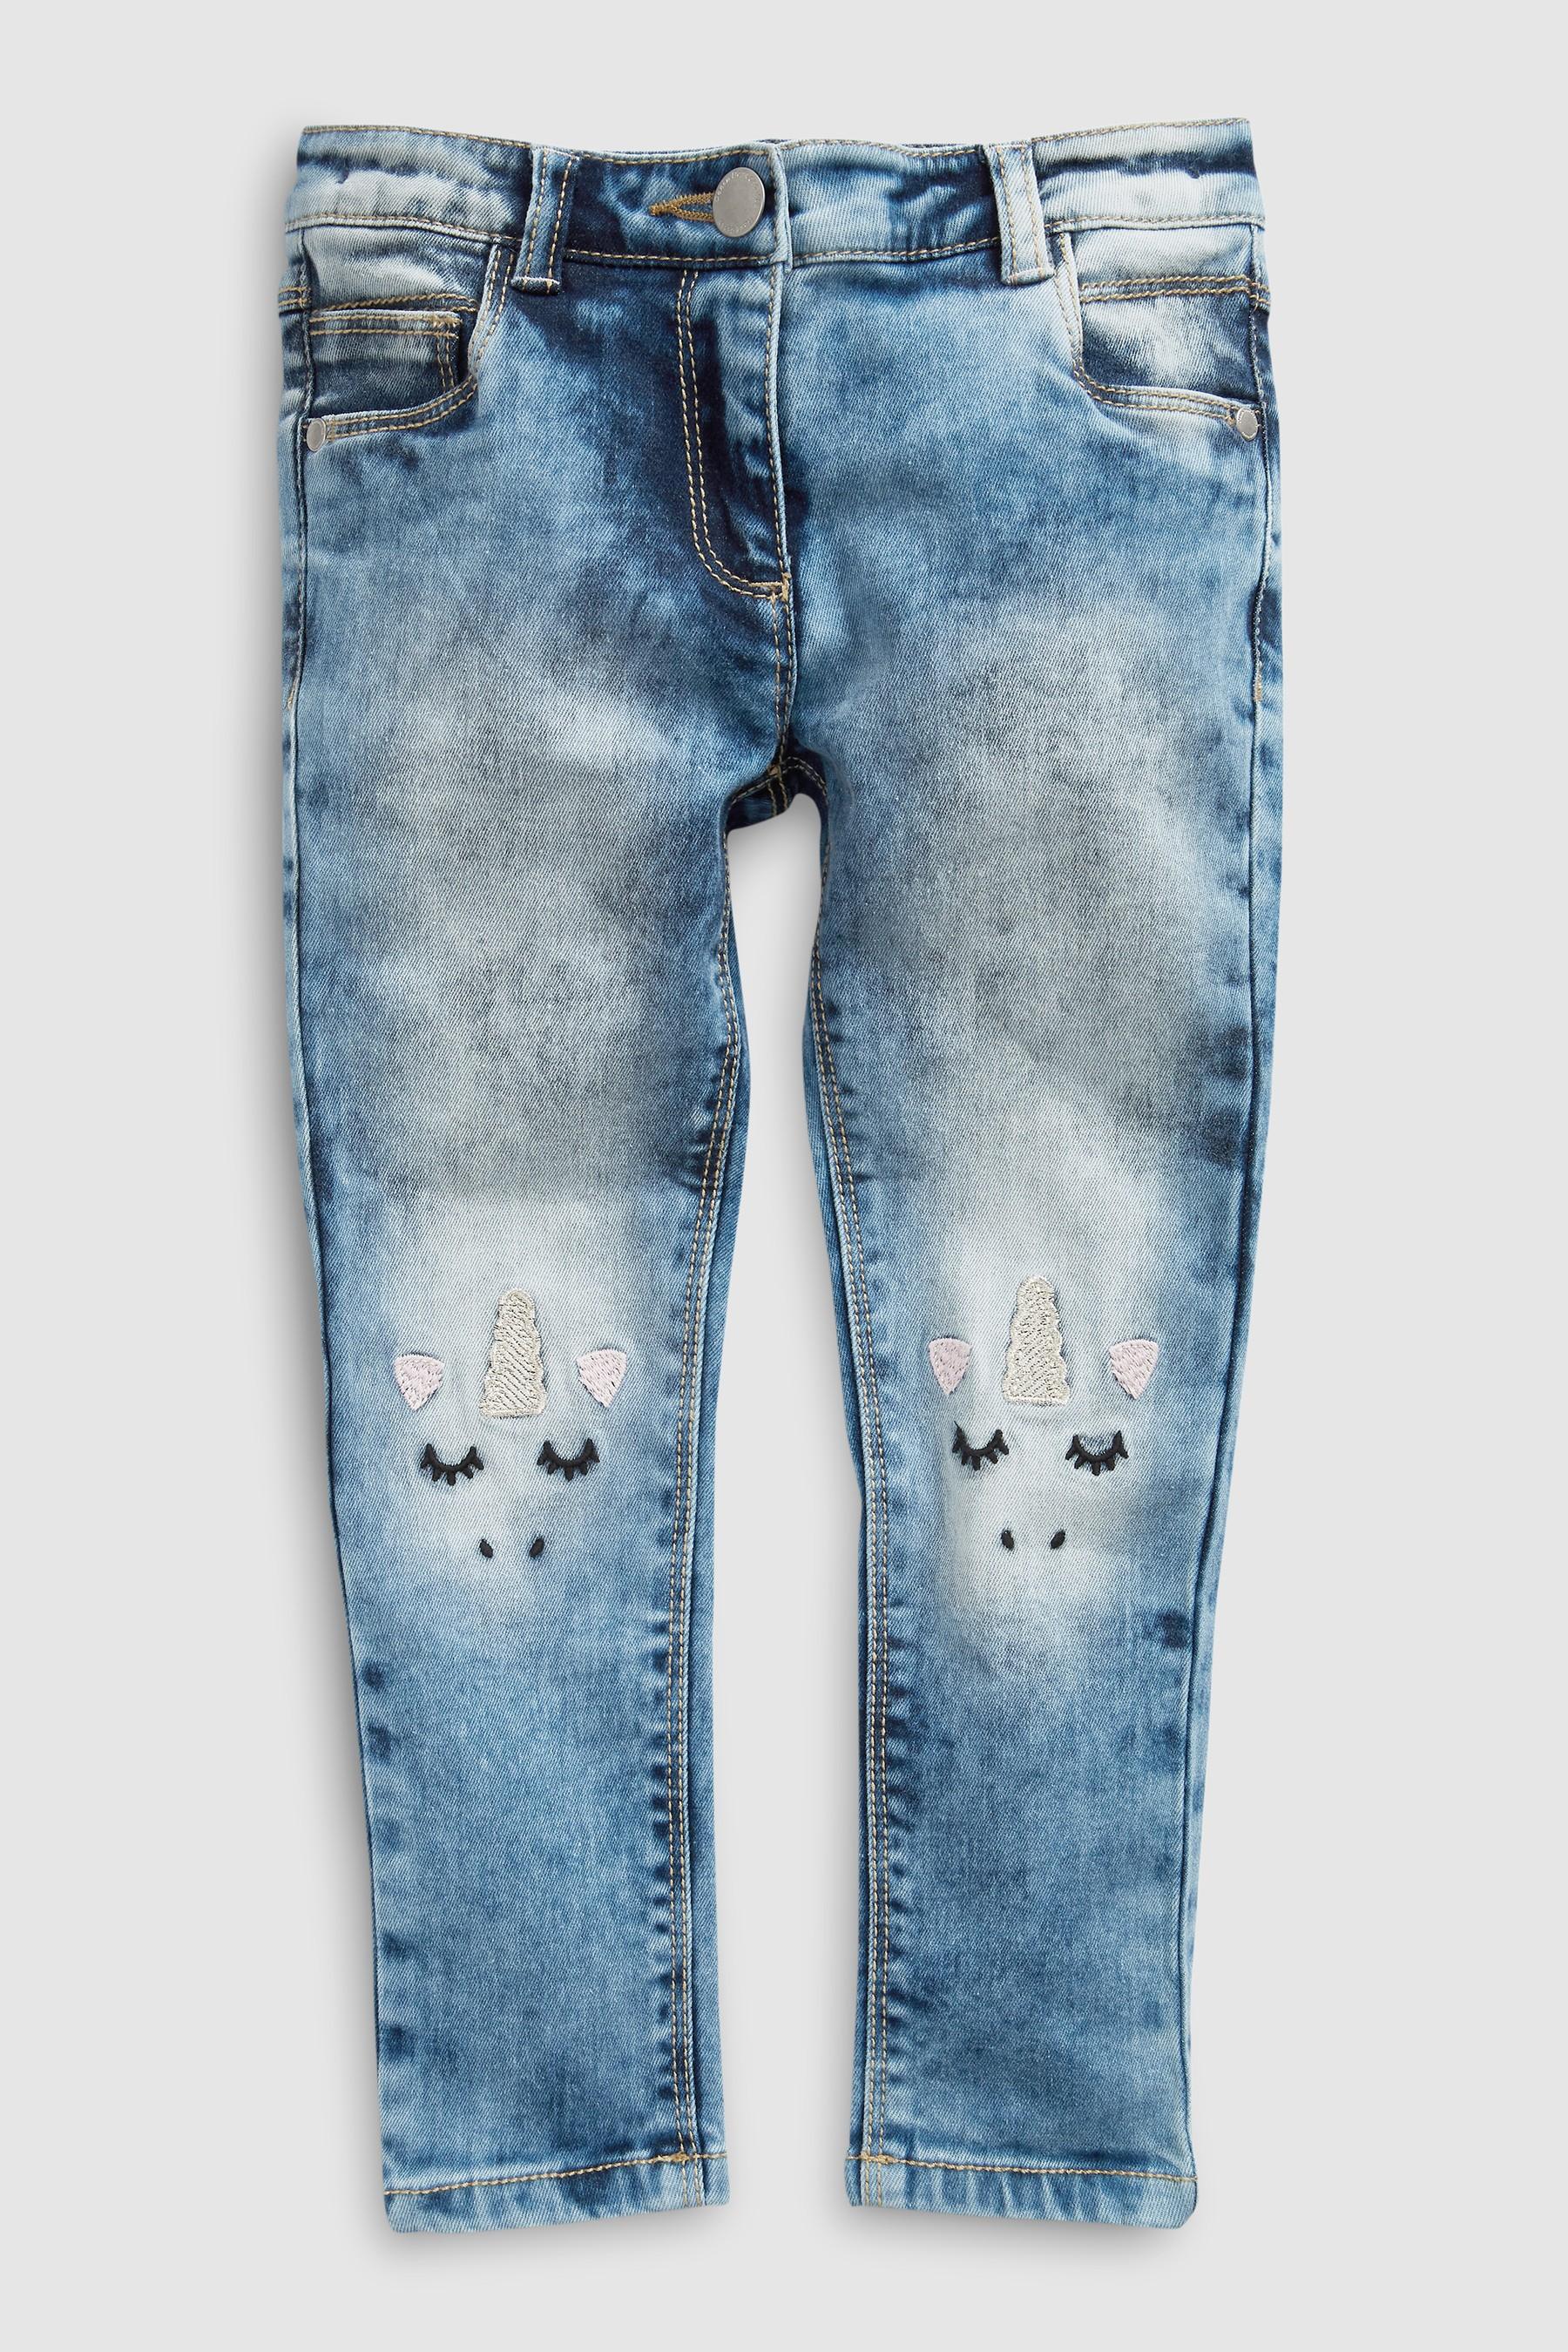 edac3fbf22 Girls Next Mid Blue Skinny Jeans With Unicorn Detail (3-16yrs ...